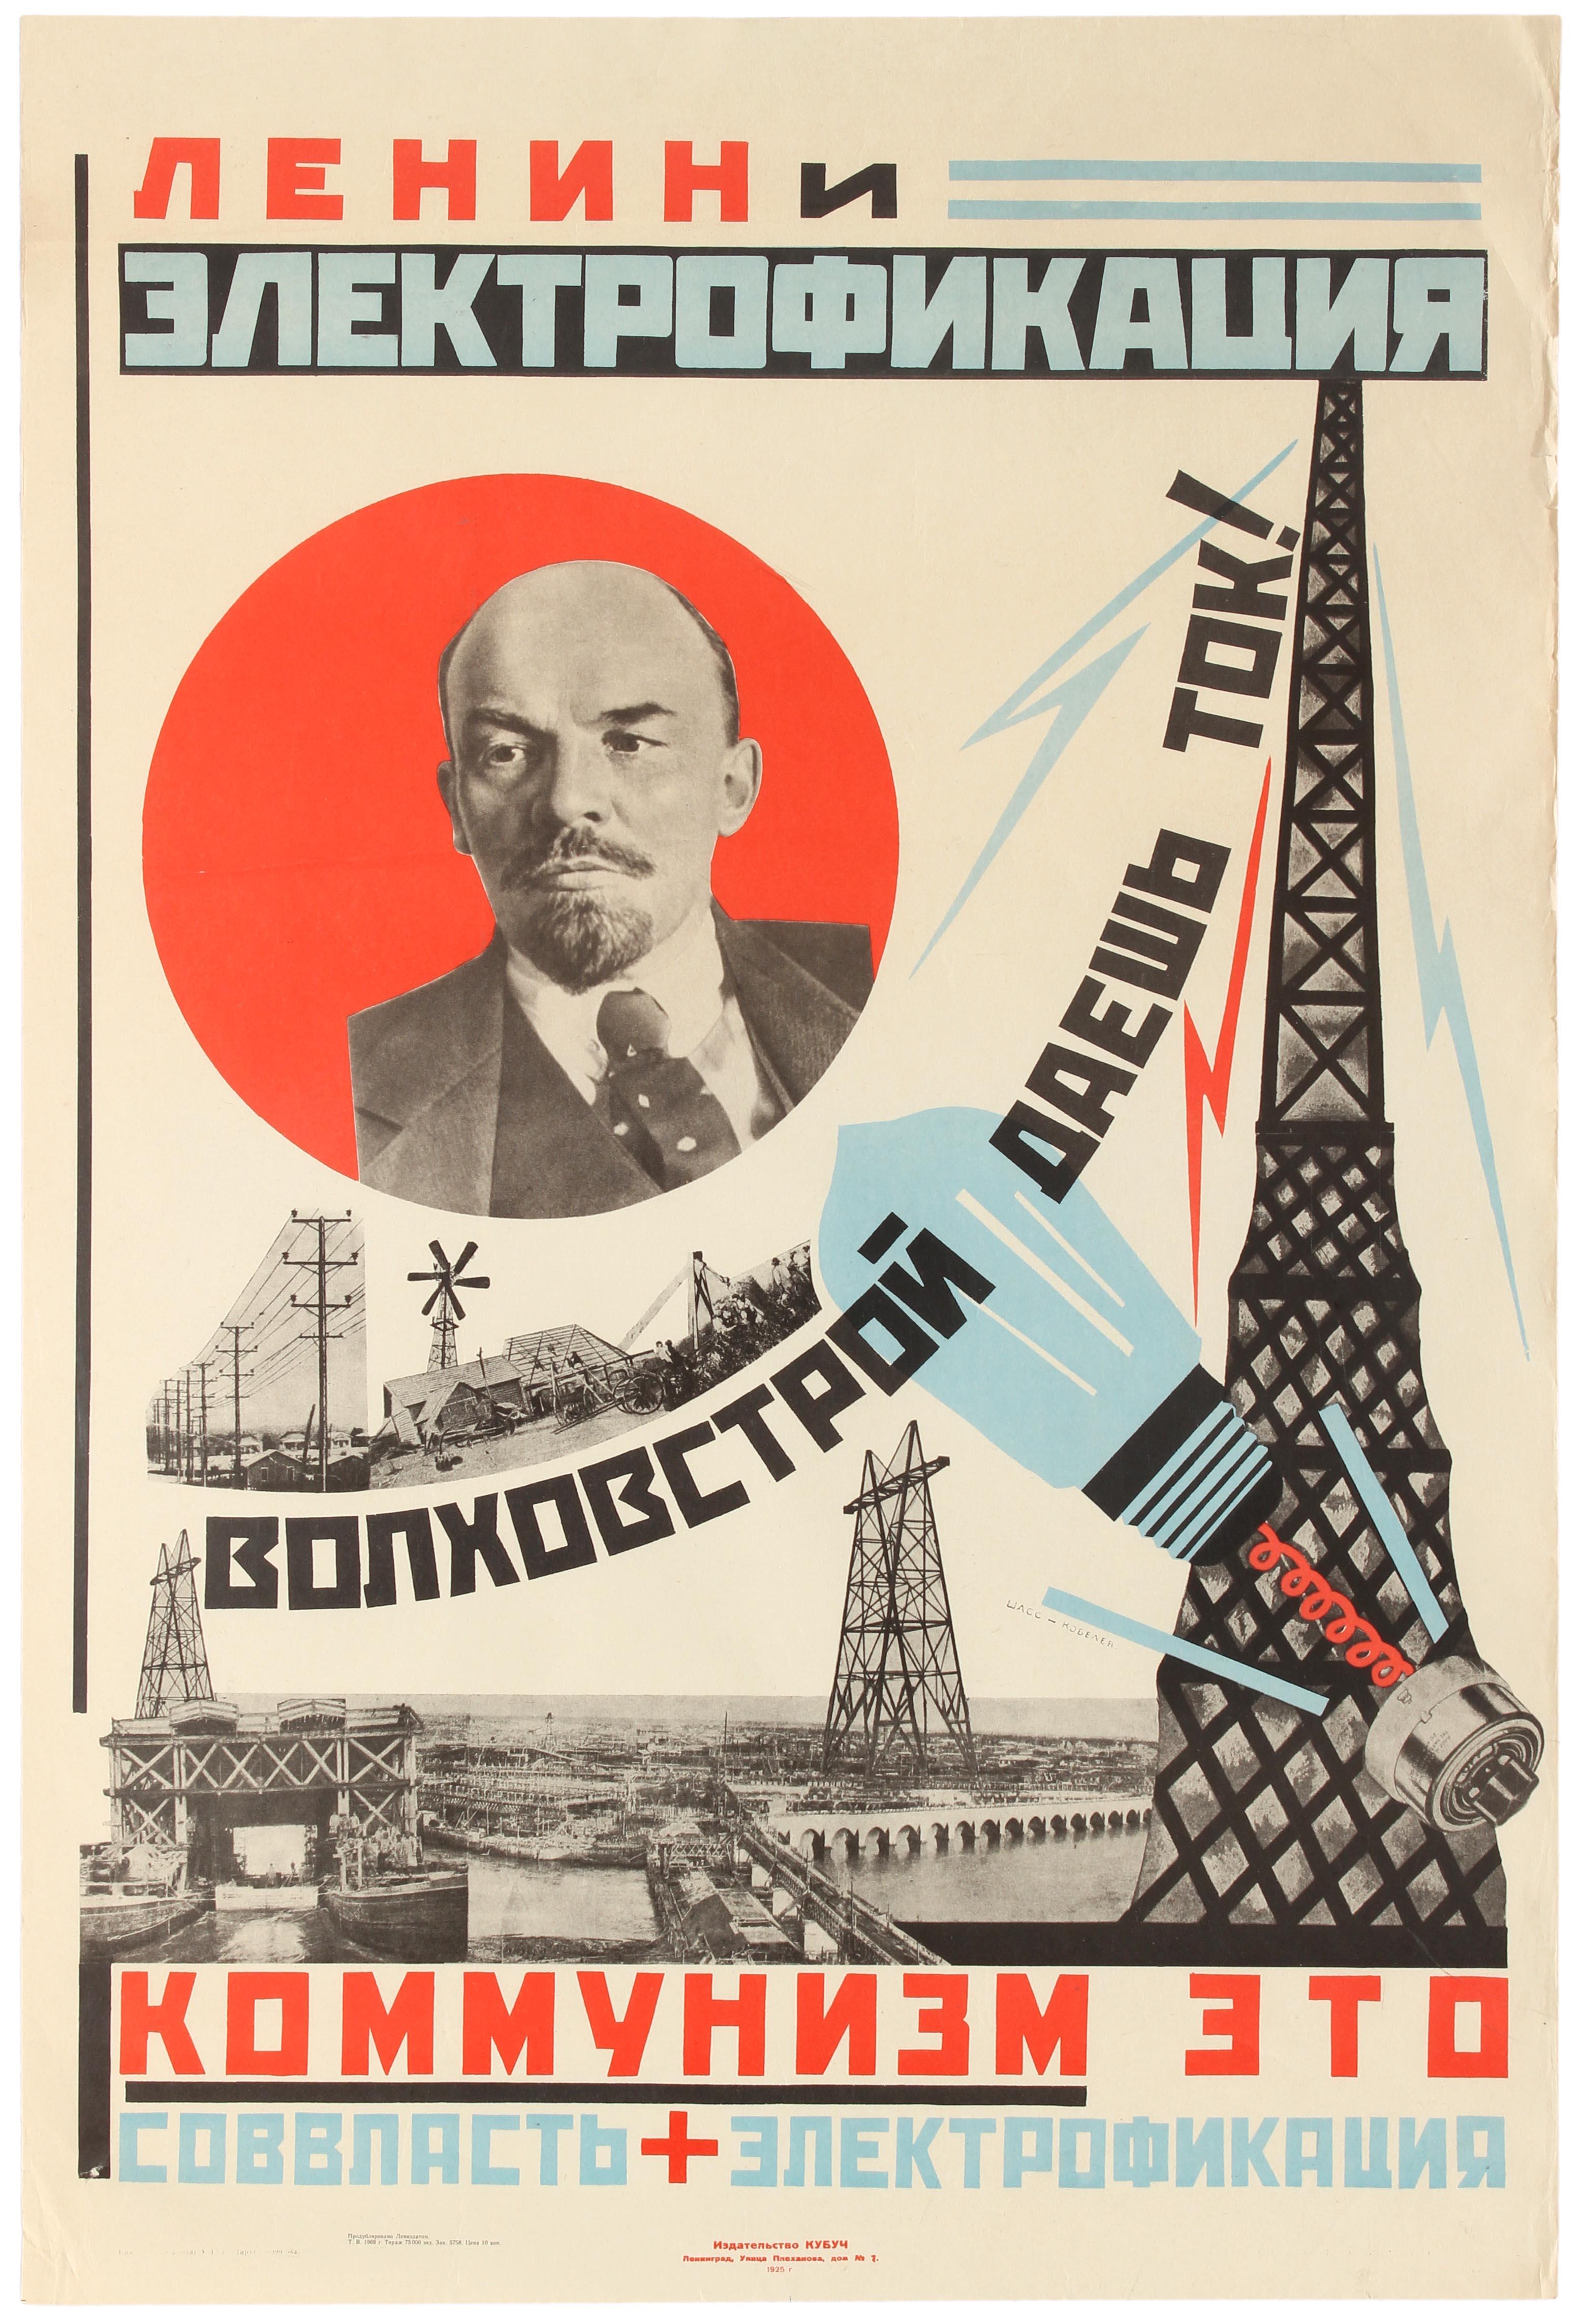 Lot 8 - Propaganda Poster Lenin Communism Electrification Constructivism